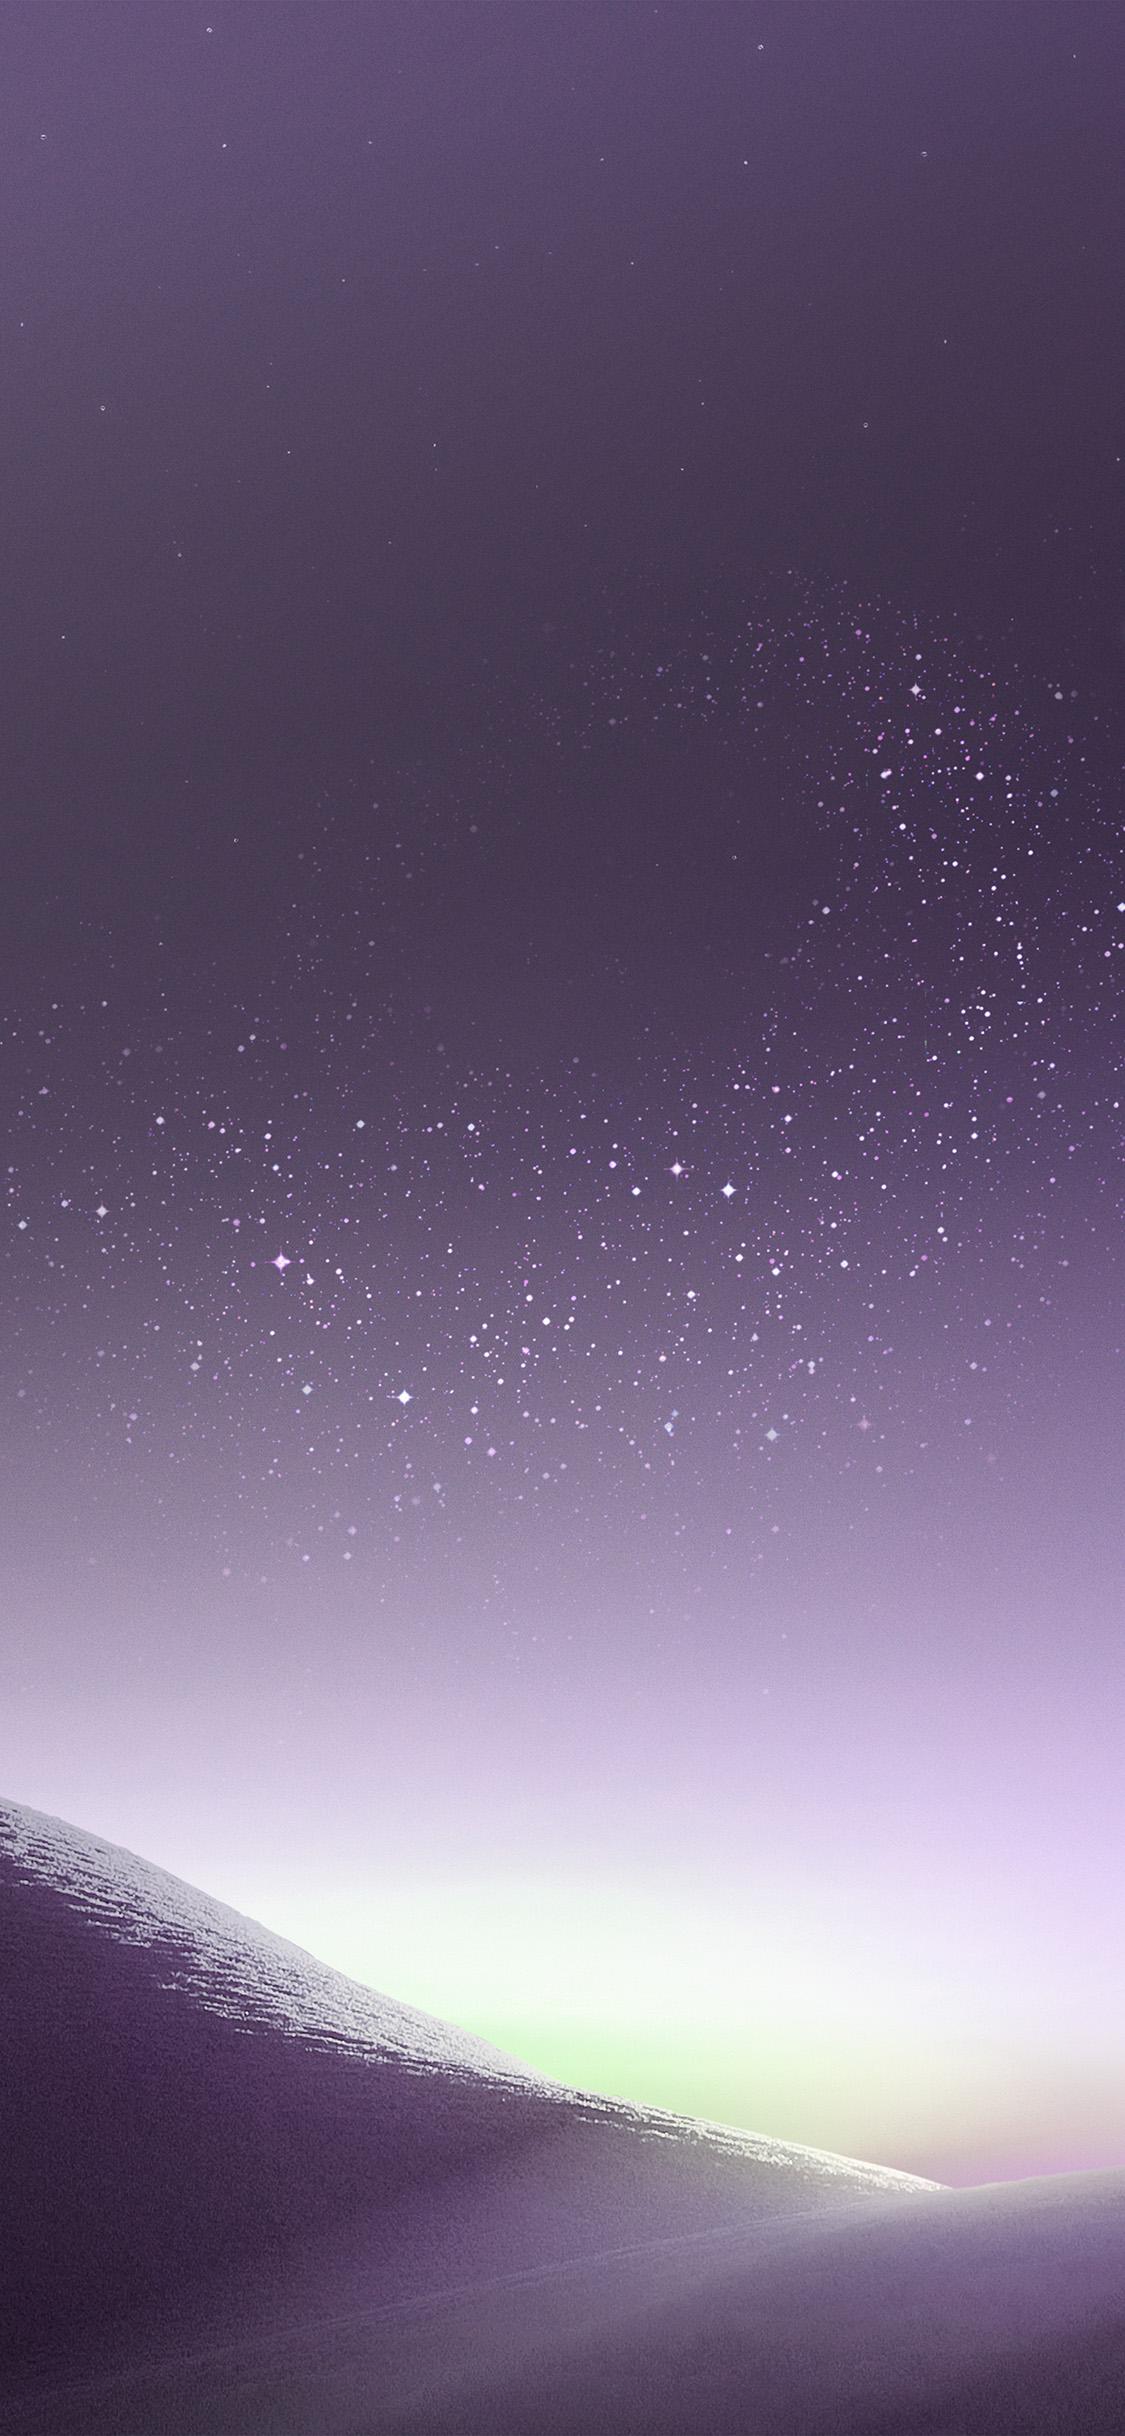 iPhonexpapers.com-Apple-iPhone-wallpaper-bc36-galaxy-night-sky-star-art-illustration-samsung-purple